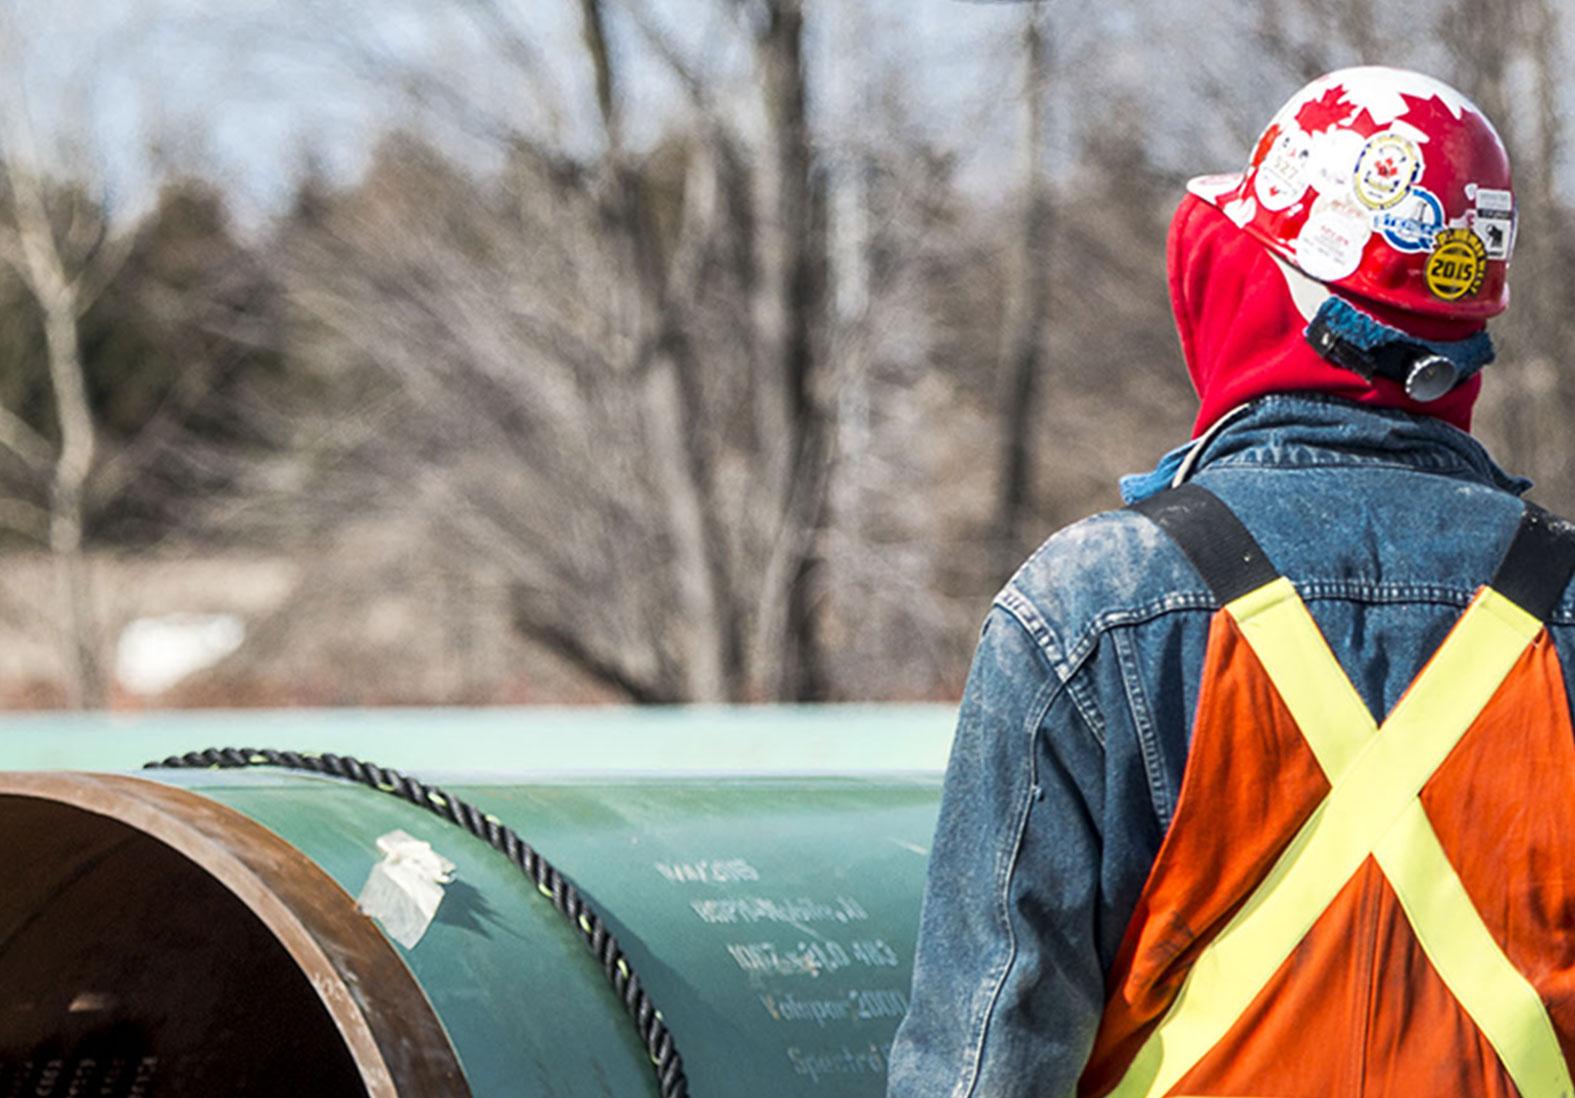 Coastal Gaslink Pipeline Worker Hardhat